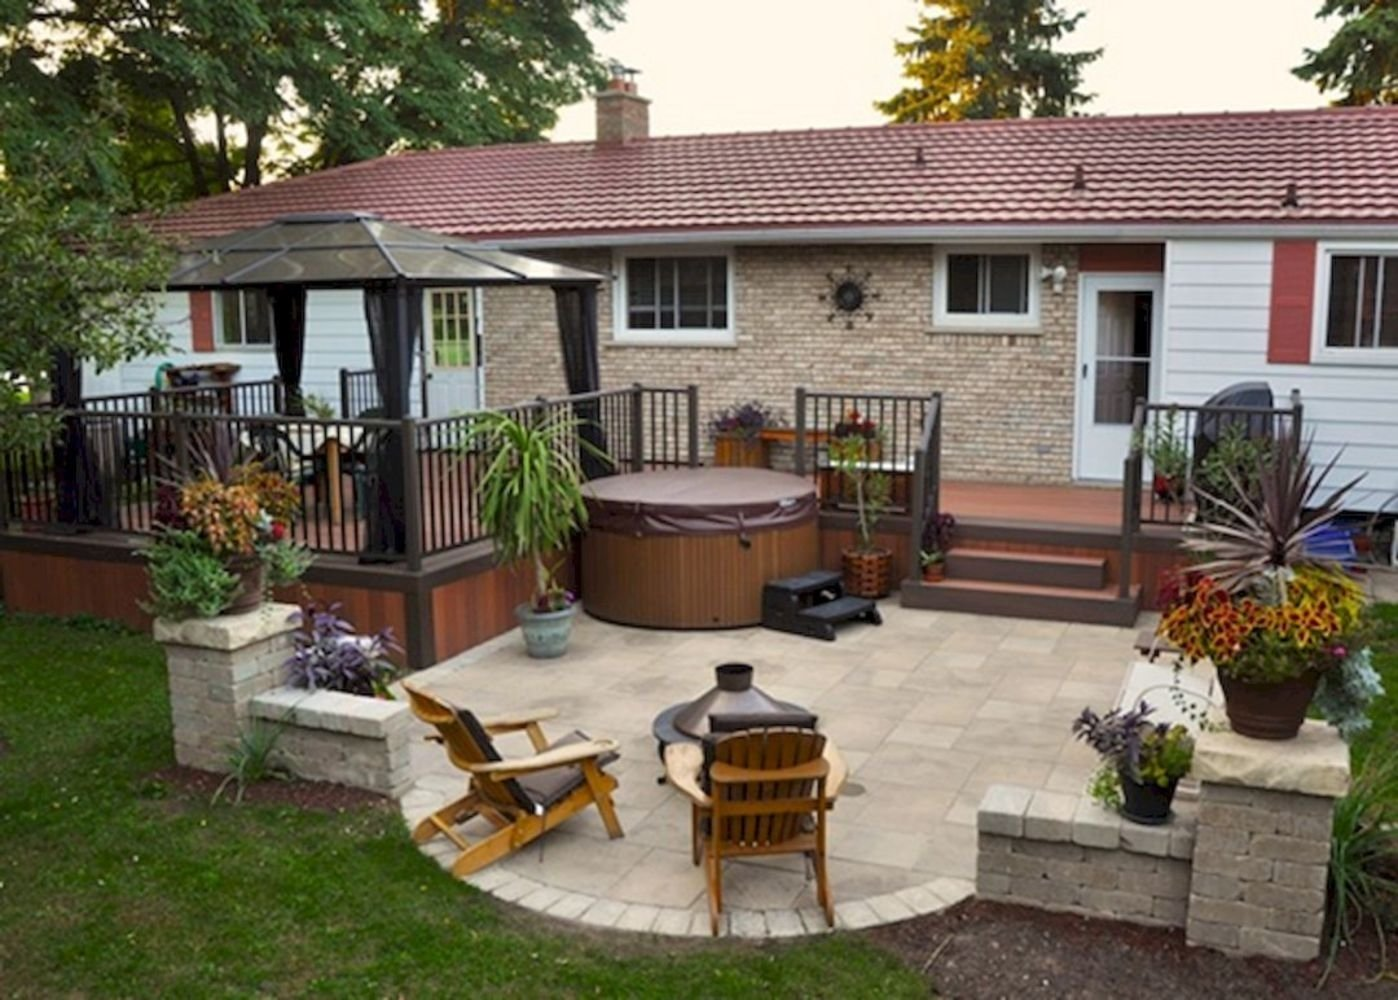 30 diy patio ideas on a budget - wartaku